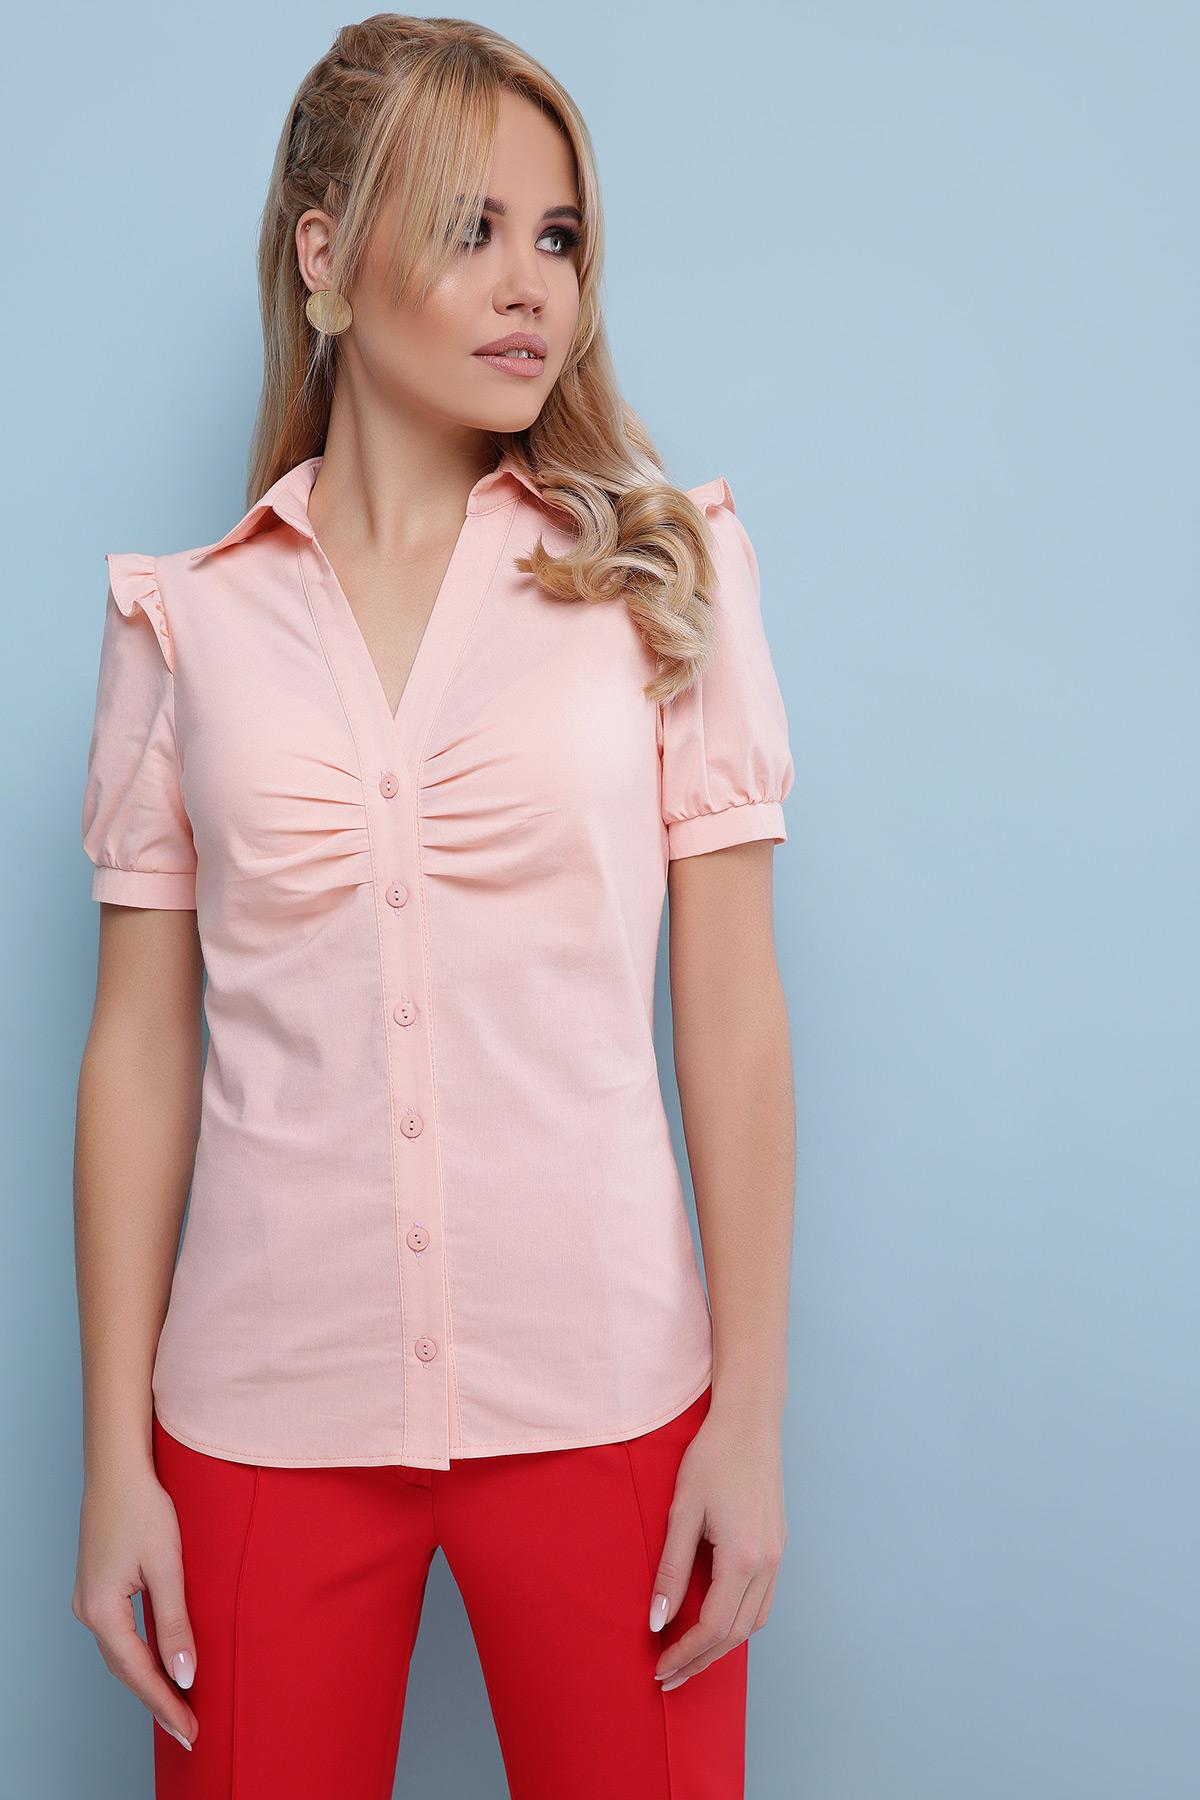 c477bfd5f4e голубая блузка с рюшами. блуза Маргарита к р. Цвет  персик купить ...